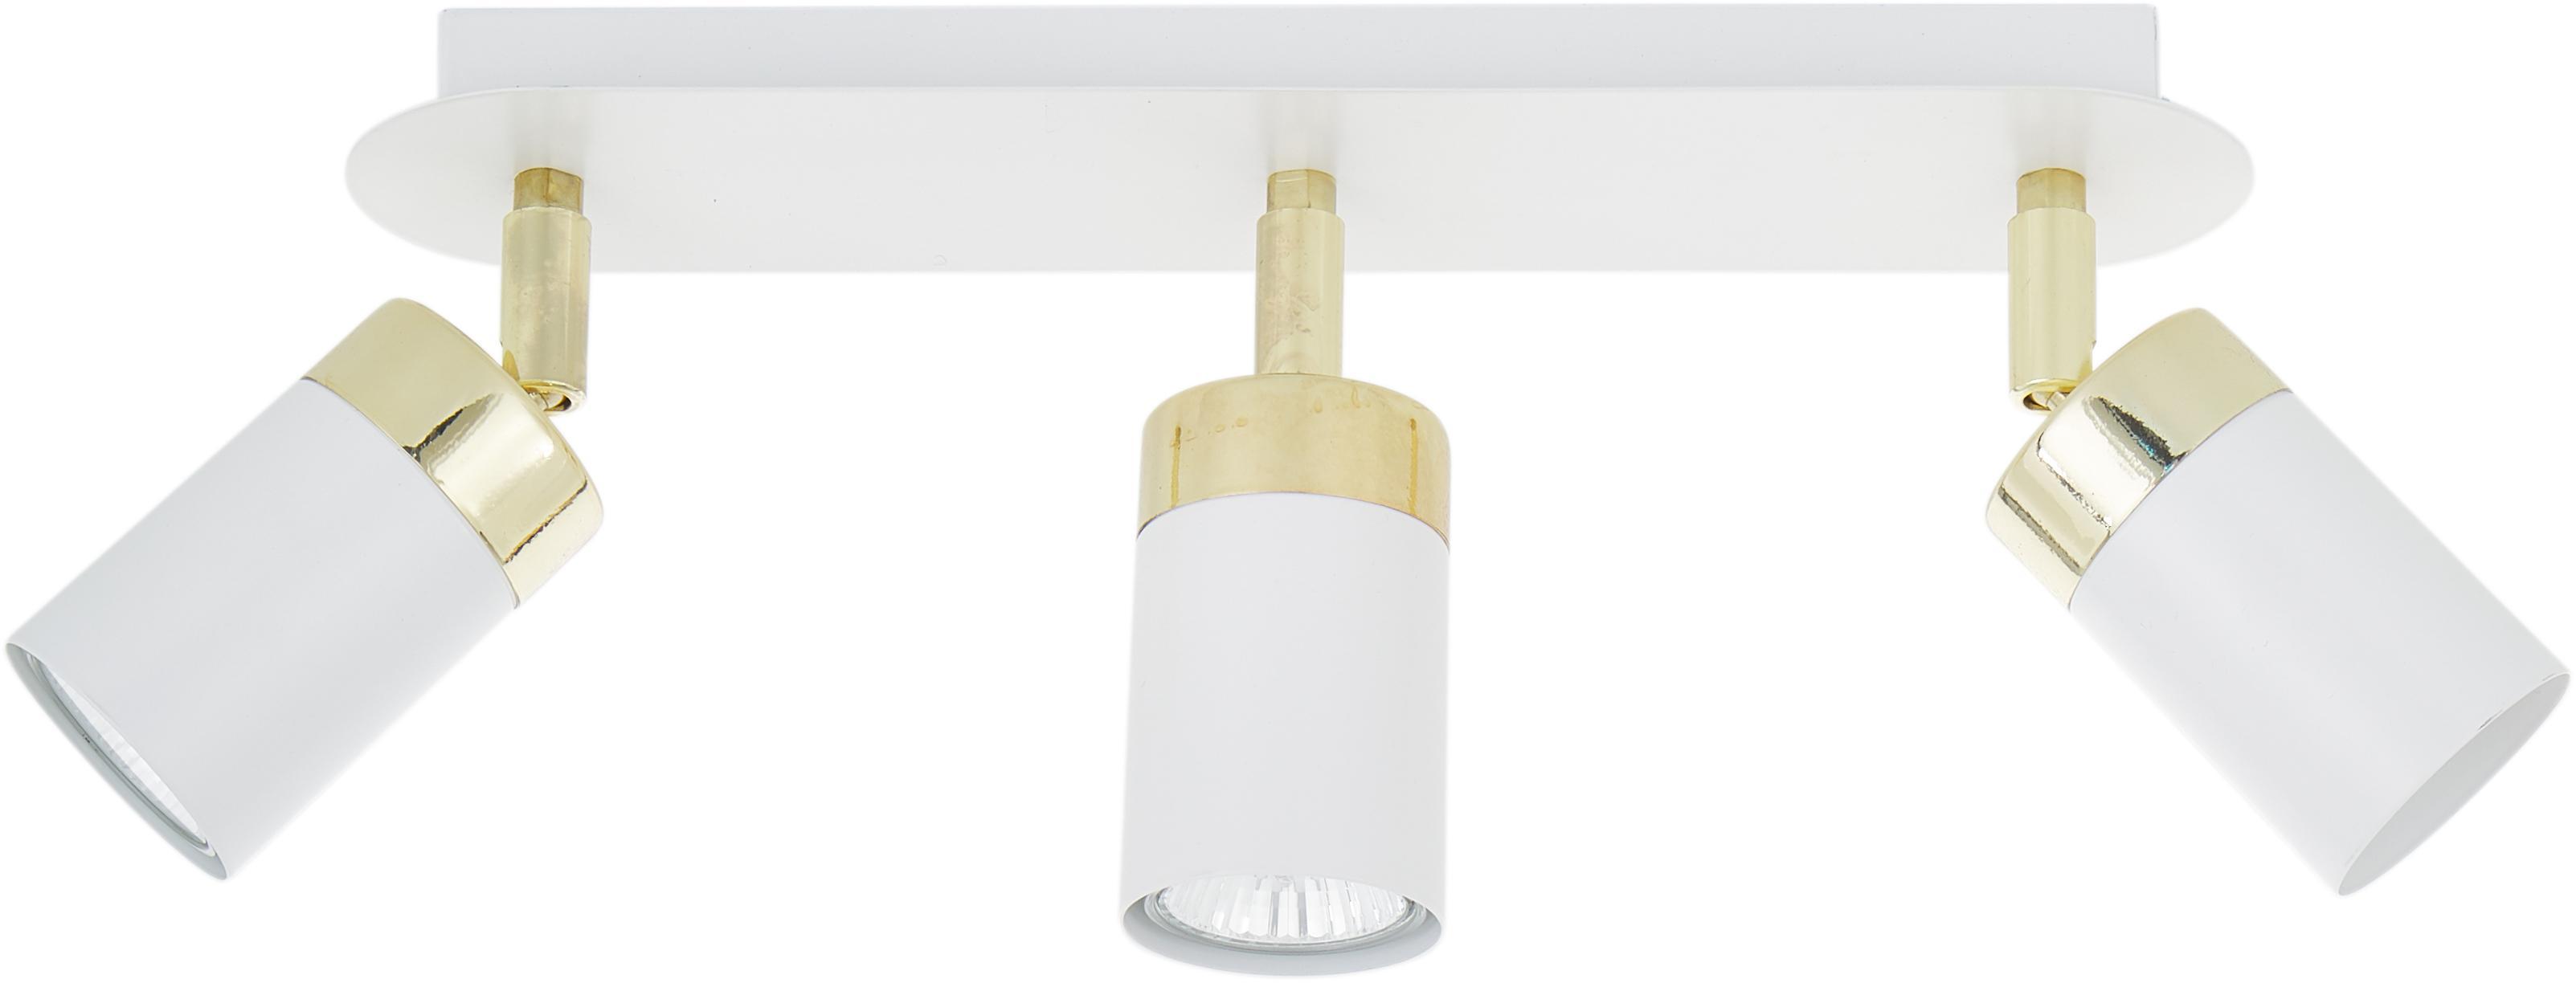 Plafondspot Joker in wit, Lampenkap: gelakt metaal, Wit, messingkleurig, 45 x 13 cm